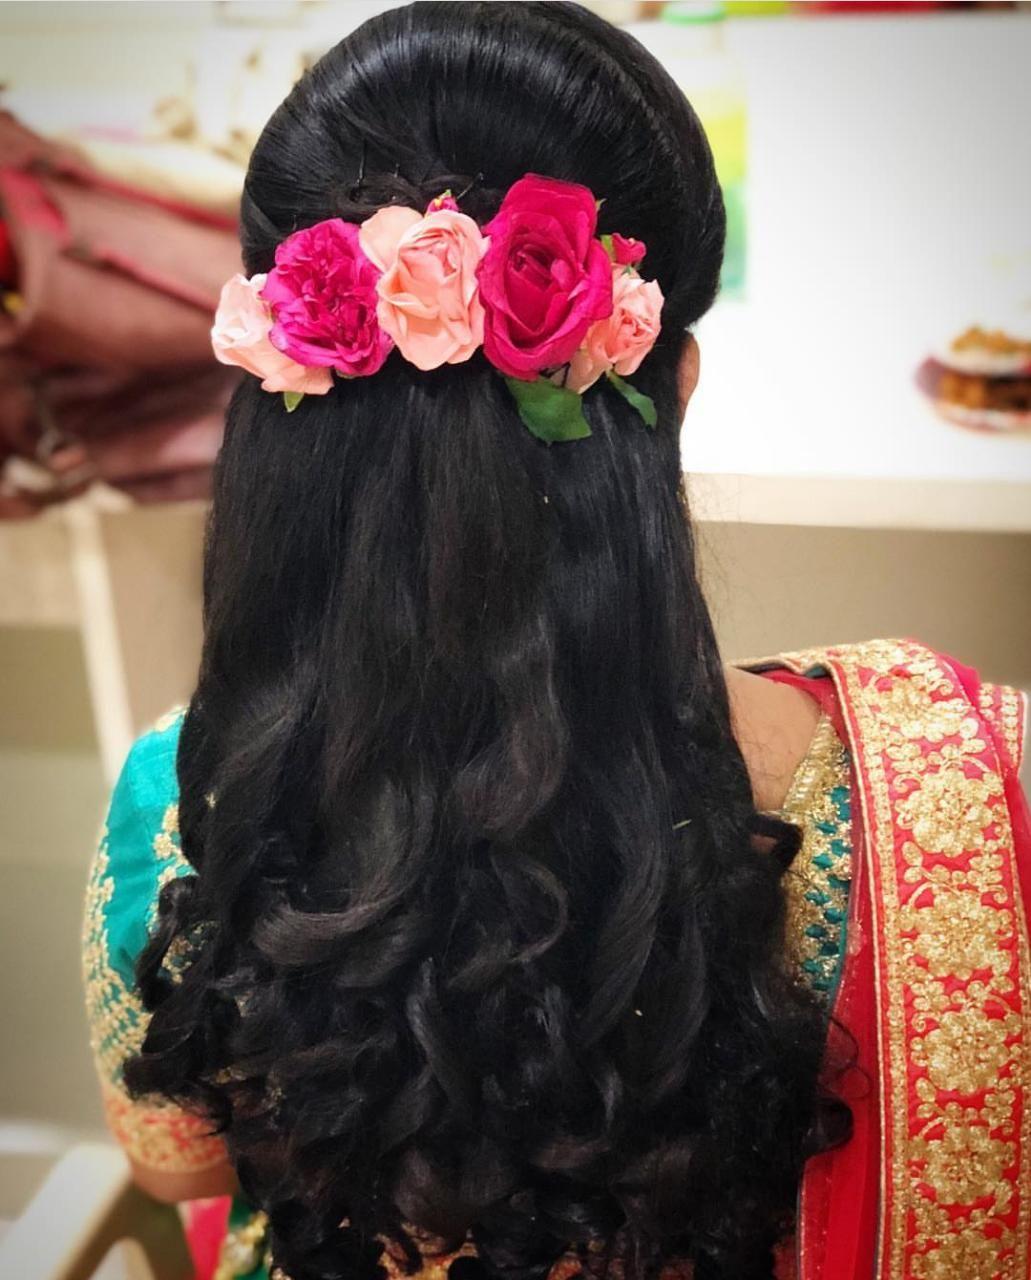 Hair model  Loose hairstyles, Floral bridal hair accessories